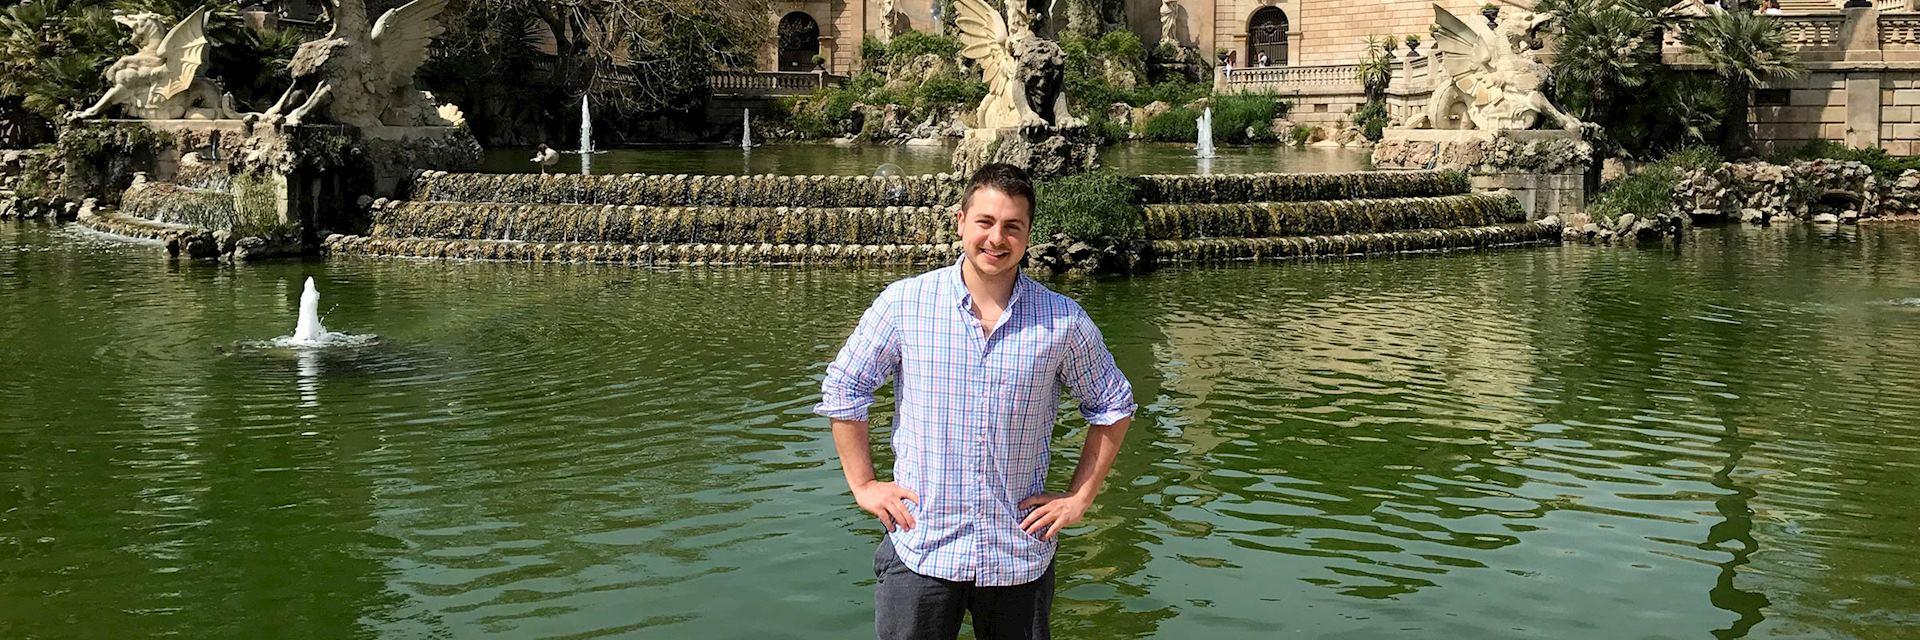 Kevin visiting Ciutadella Park, Spain